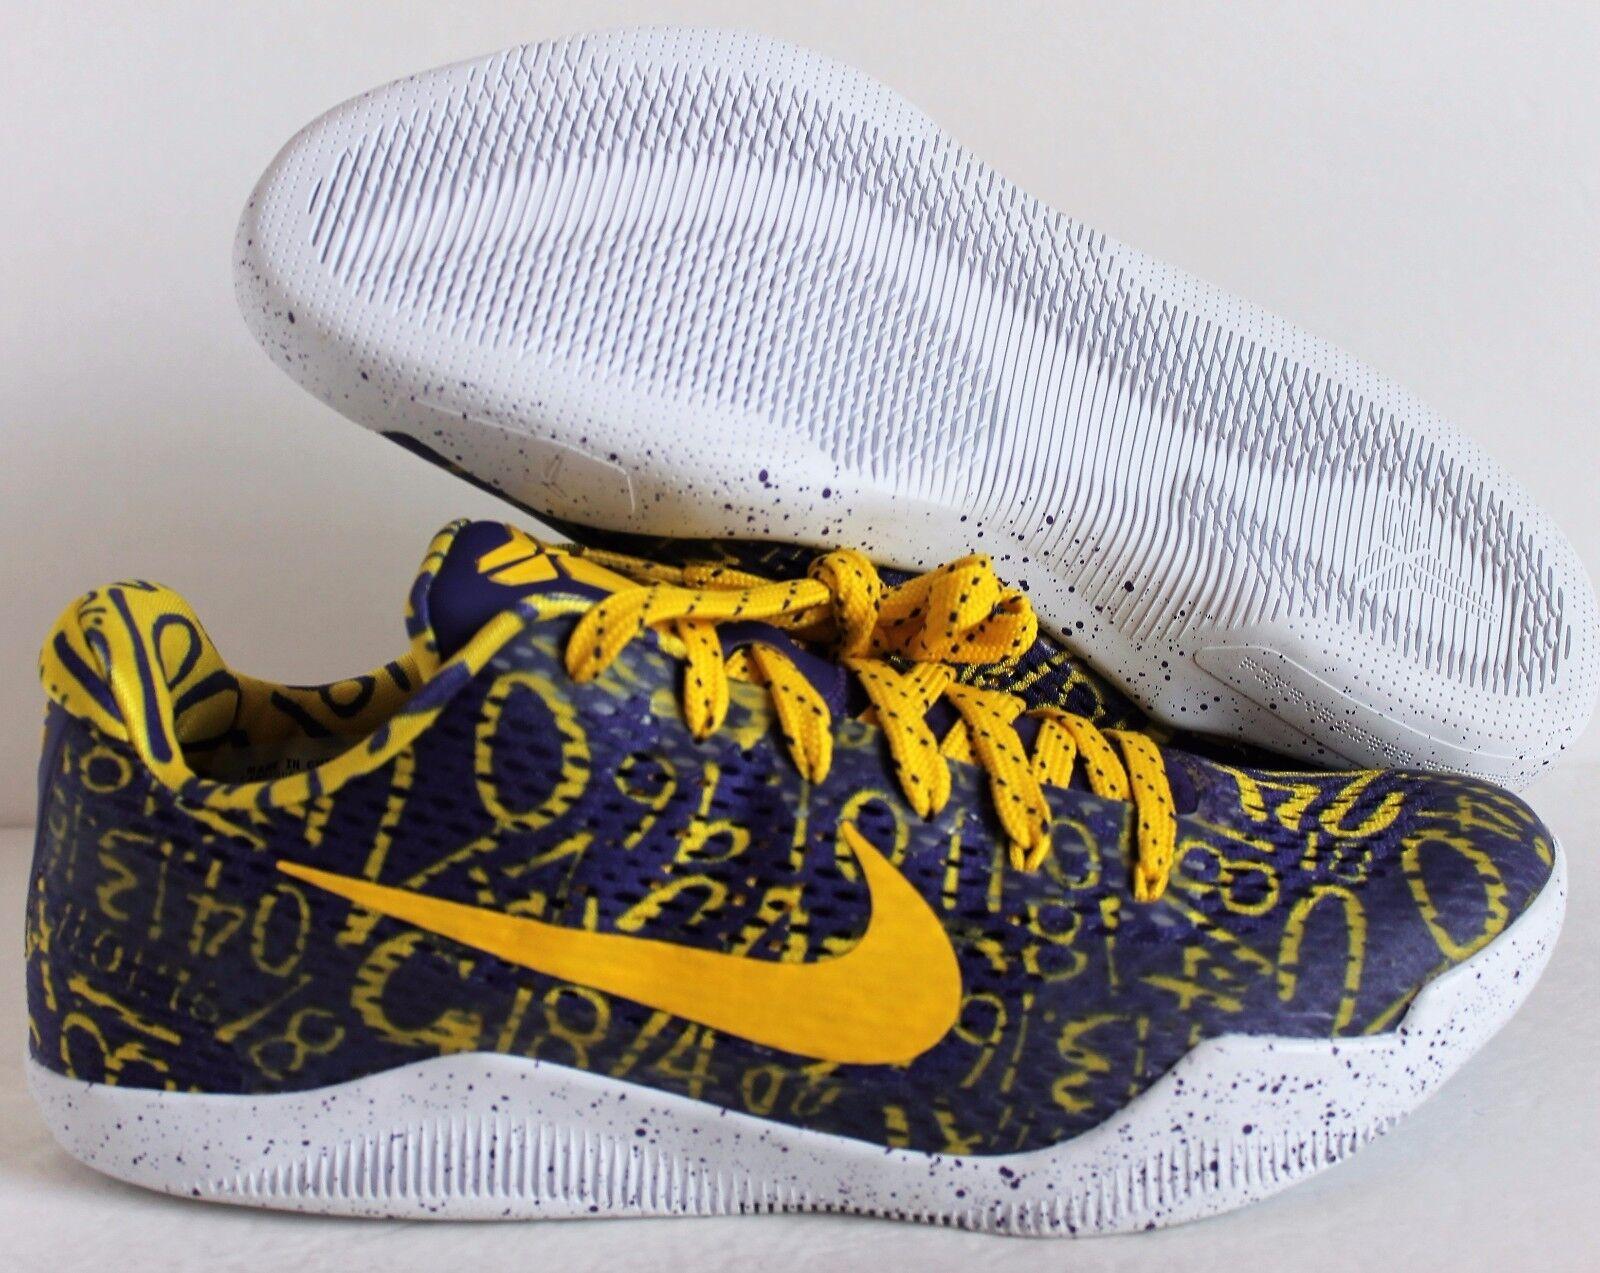 Nike kobe xi 11 id mamba giorno varsity viola giallo bianco sz 10 [865773-991]